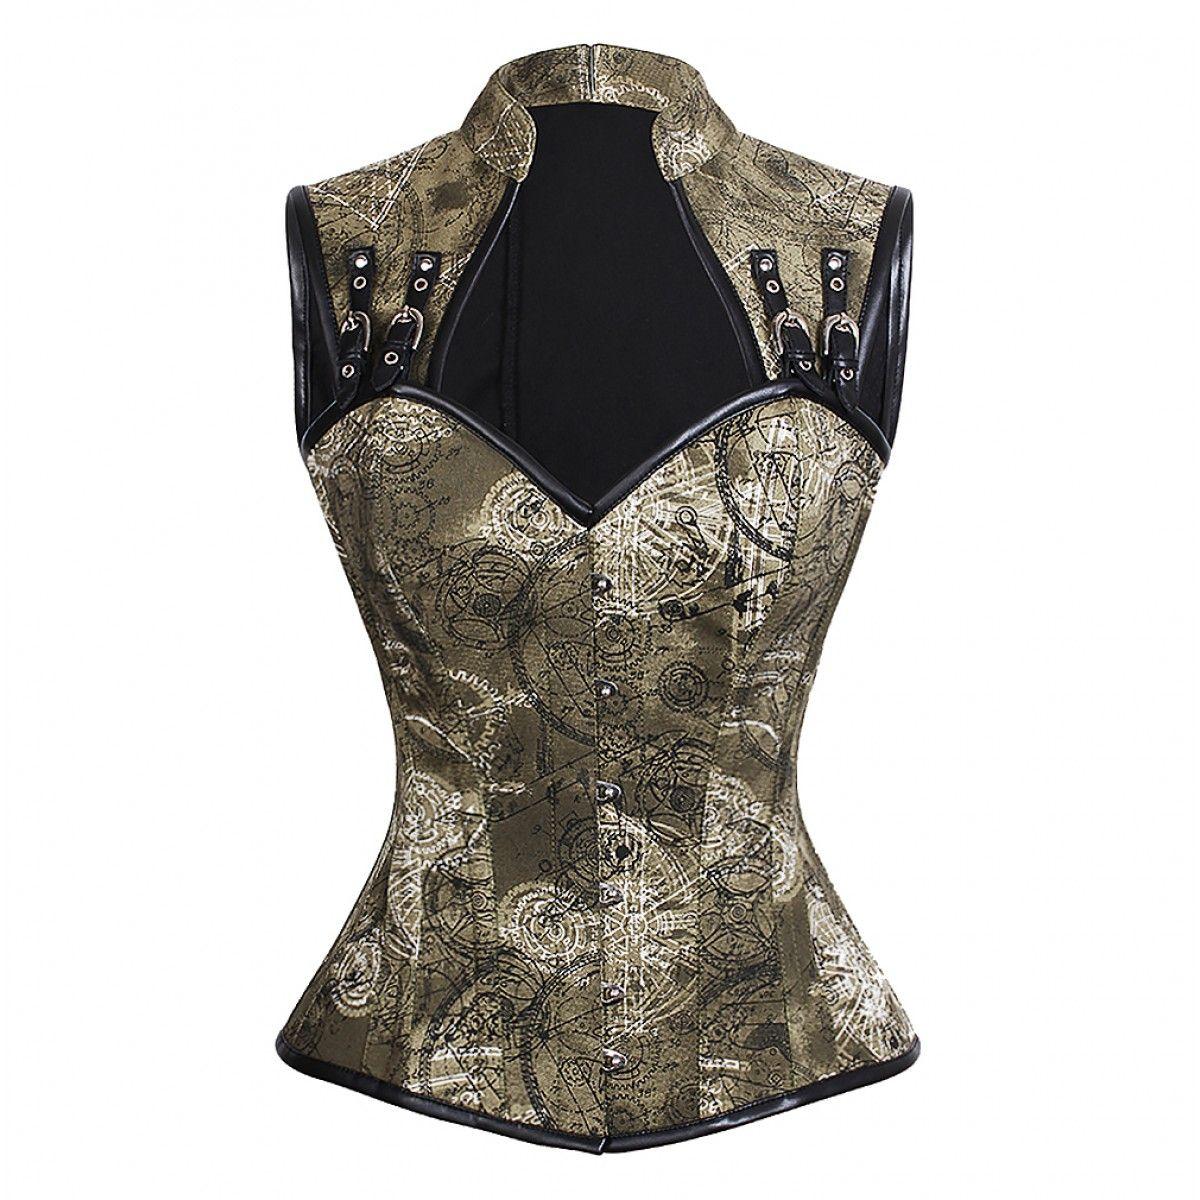 d74a569a8 Discover alternative fashion at Alt Noir! Thekla Steel Bone Steampunk  Overbust Corset